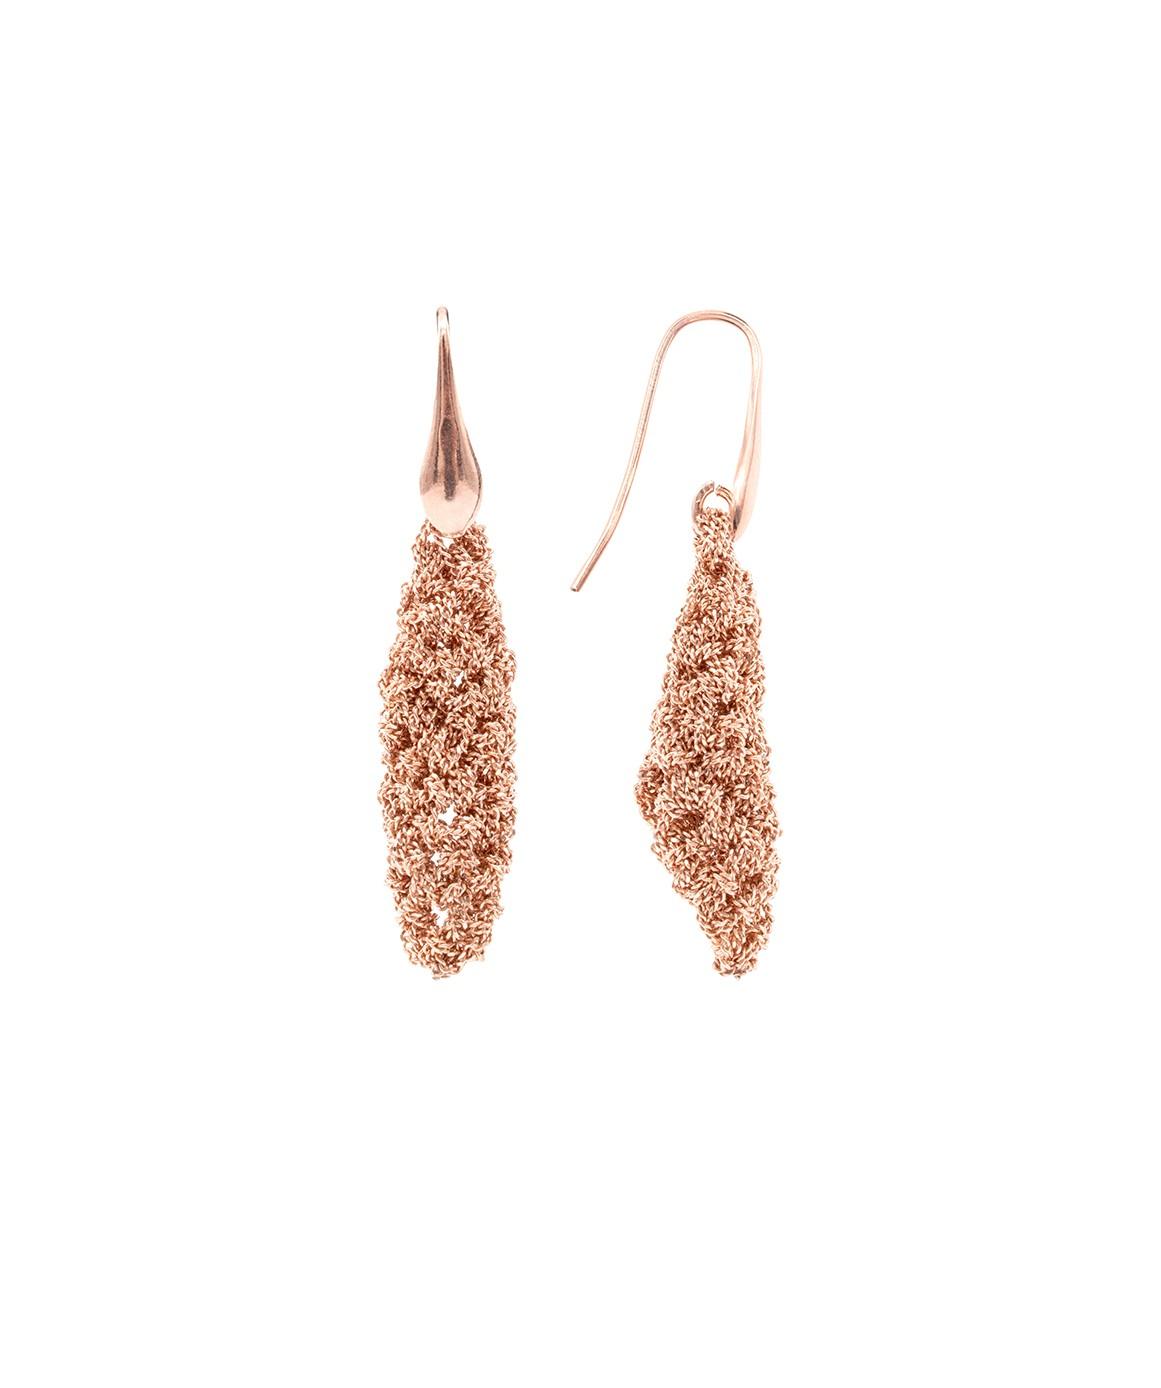 RHOMBUS SHORT Earrings in Sterling Silver 14Kt. Rose gold plated